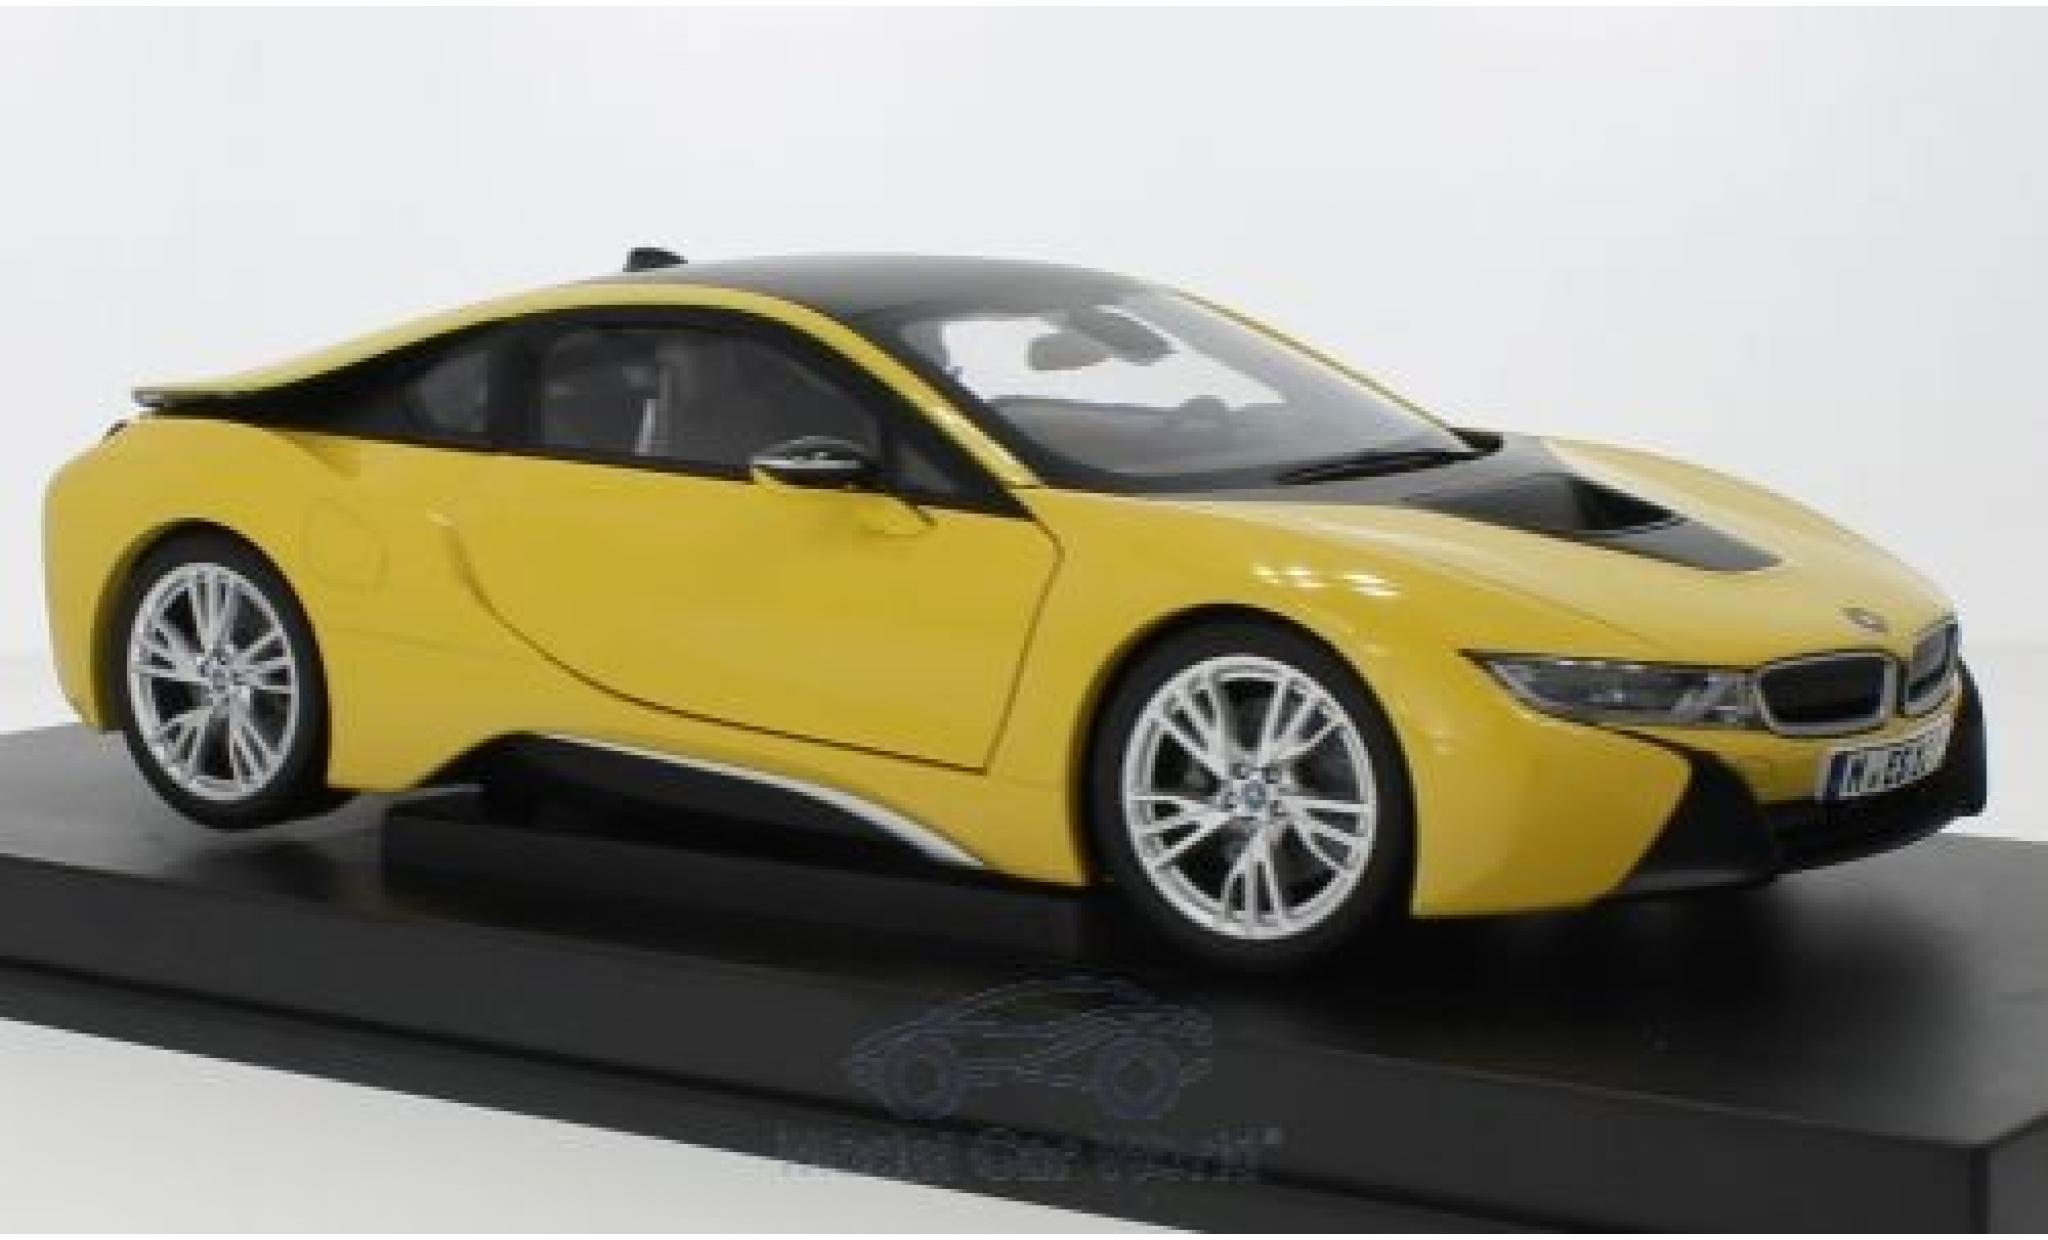 Bmw i8 1/18 Paragon yellow